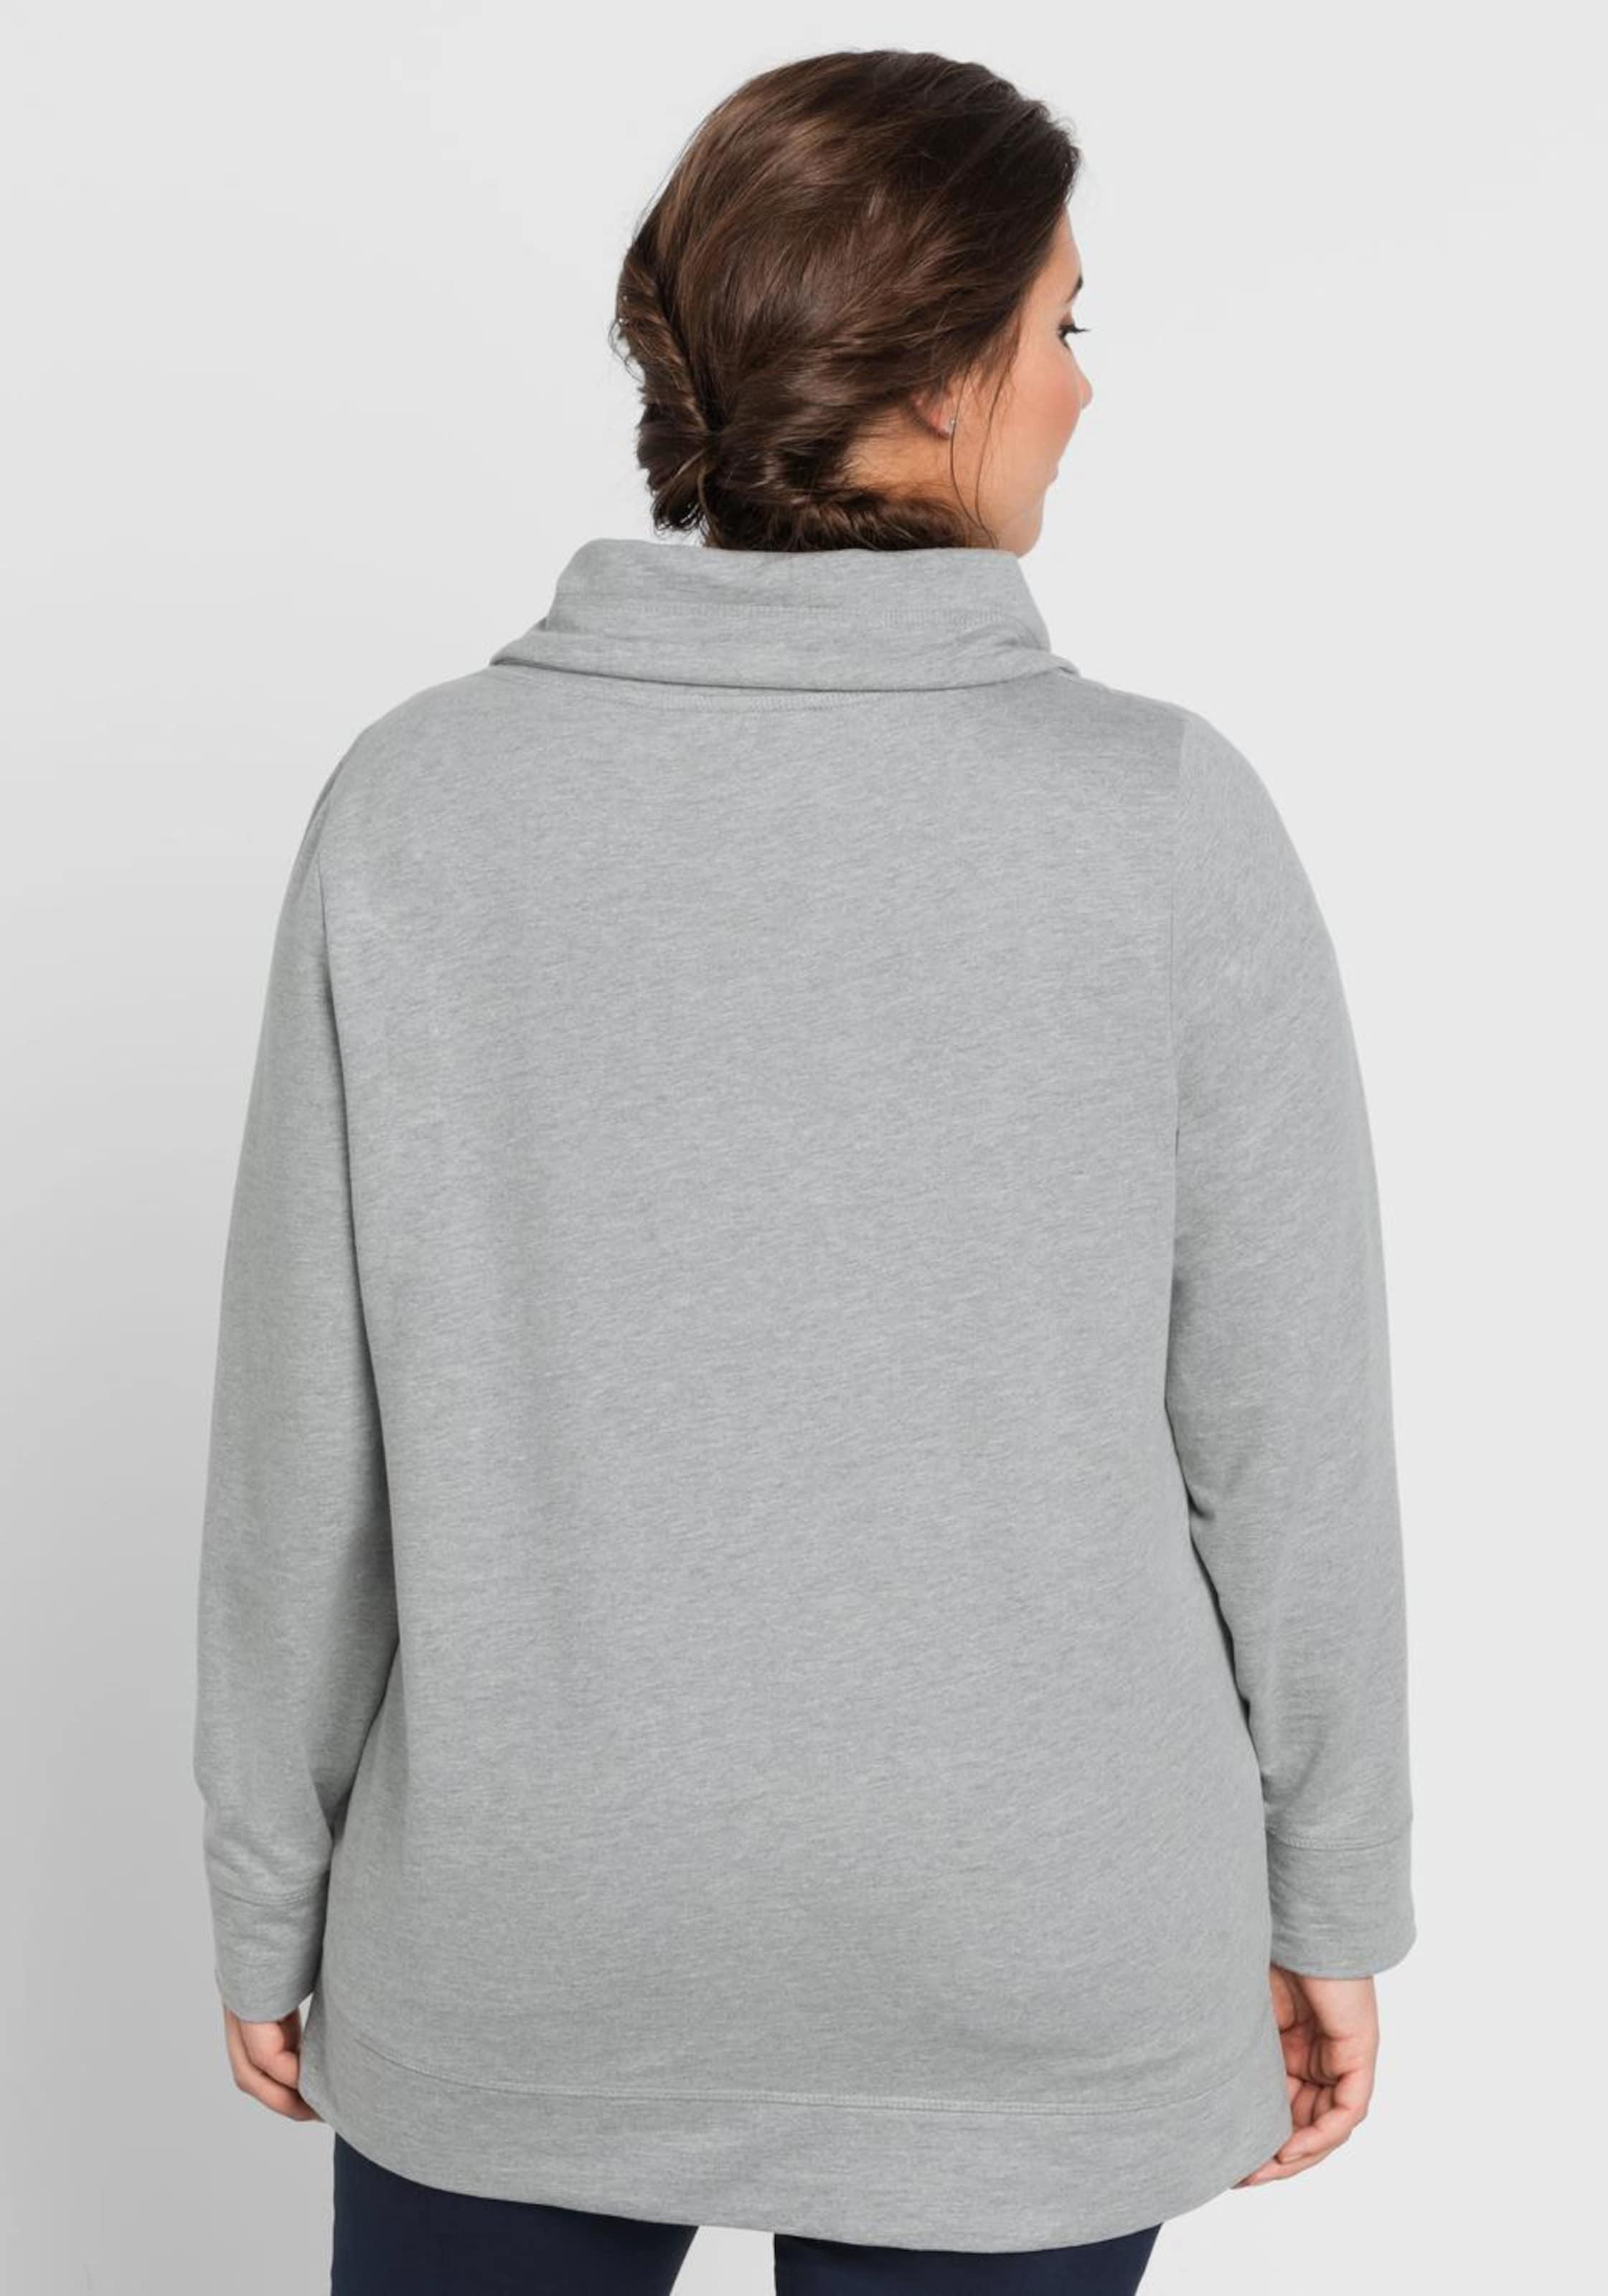 Grau In Sheego Sweatshirt In Sweatshirt Sweatshirt Grau Sheego Sheego TOXZuwPki